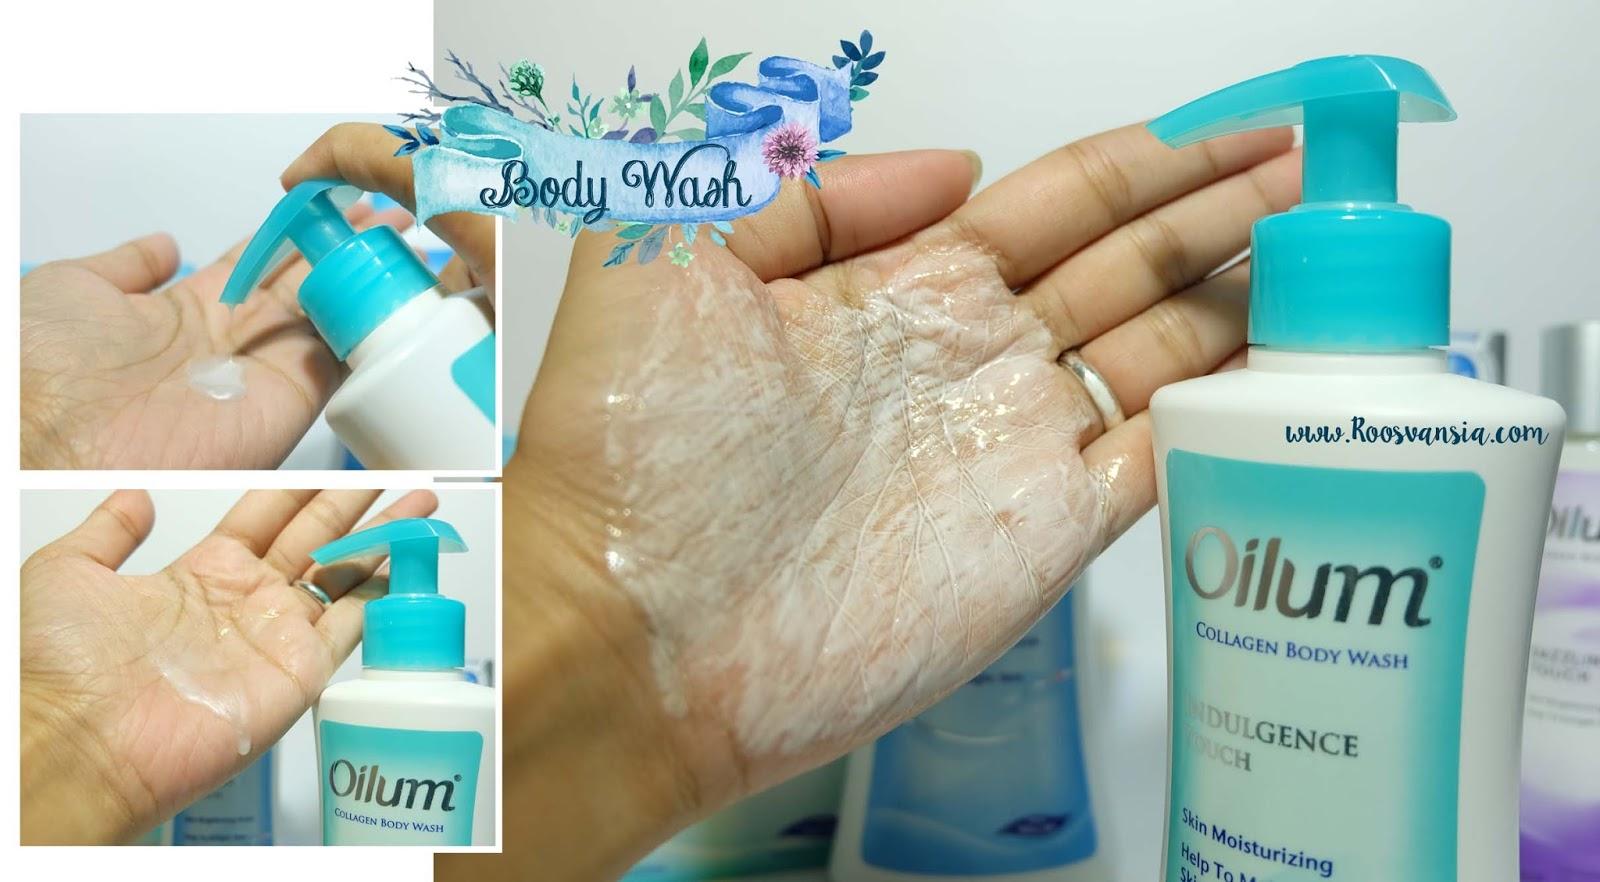 Oilum Collagen Skin Moisturizing Skin Brightening Series Soap Bar Body Wash Lotion Roosvansia